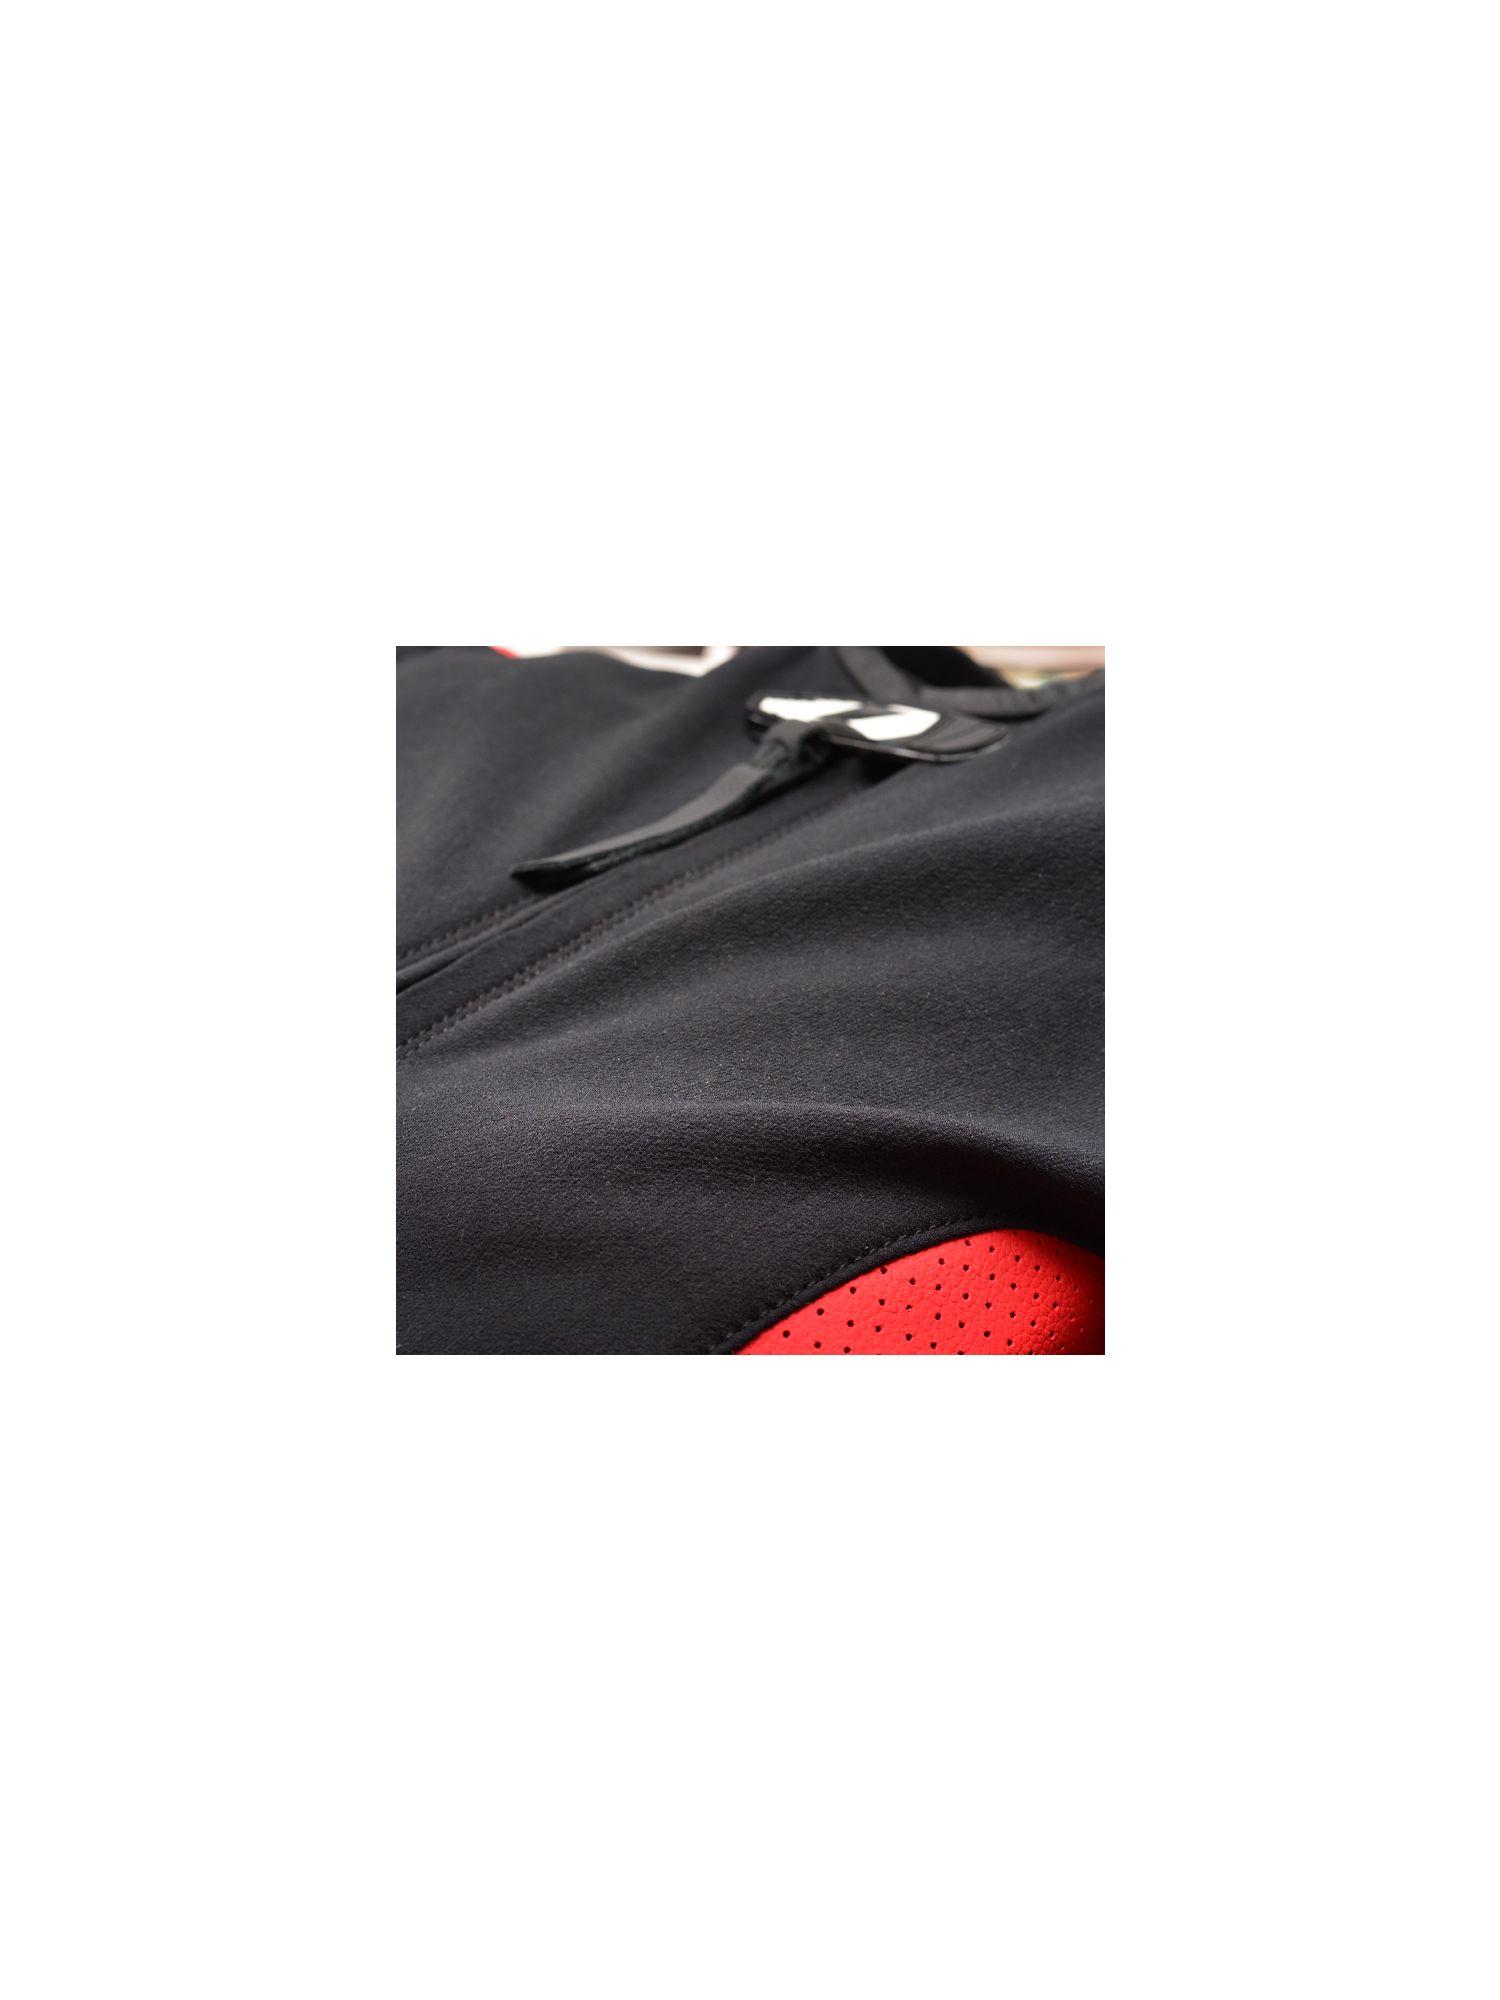 NXL022 | J022 KID'S LEATHER SUIT[3colors]